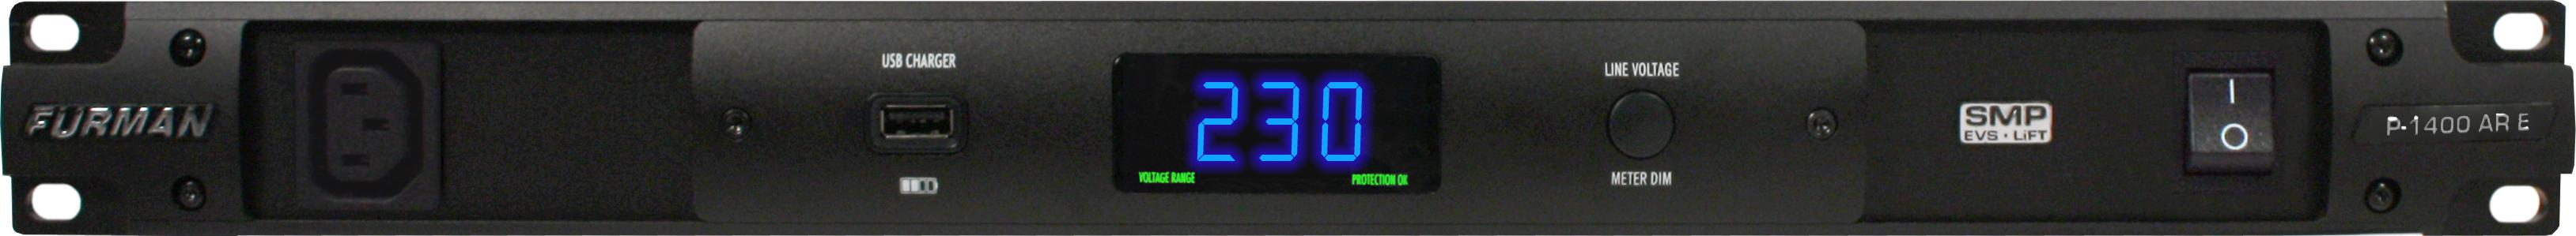 Furman P1400 AR E įtampos stabilizatorius